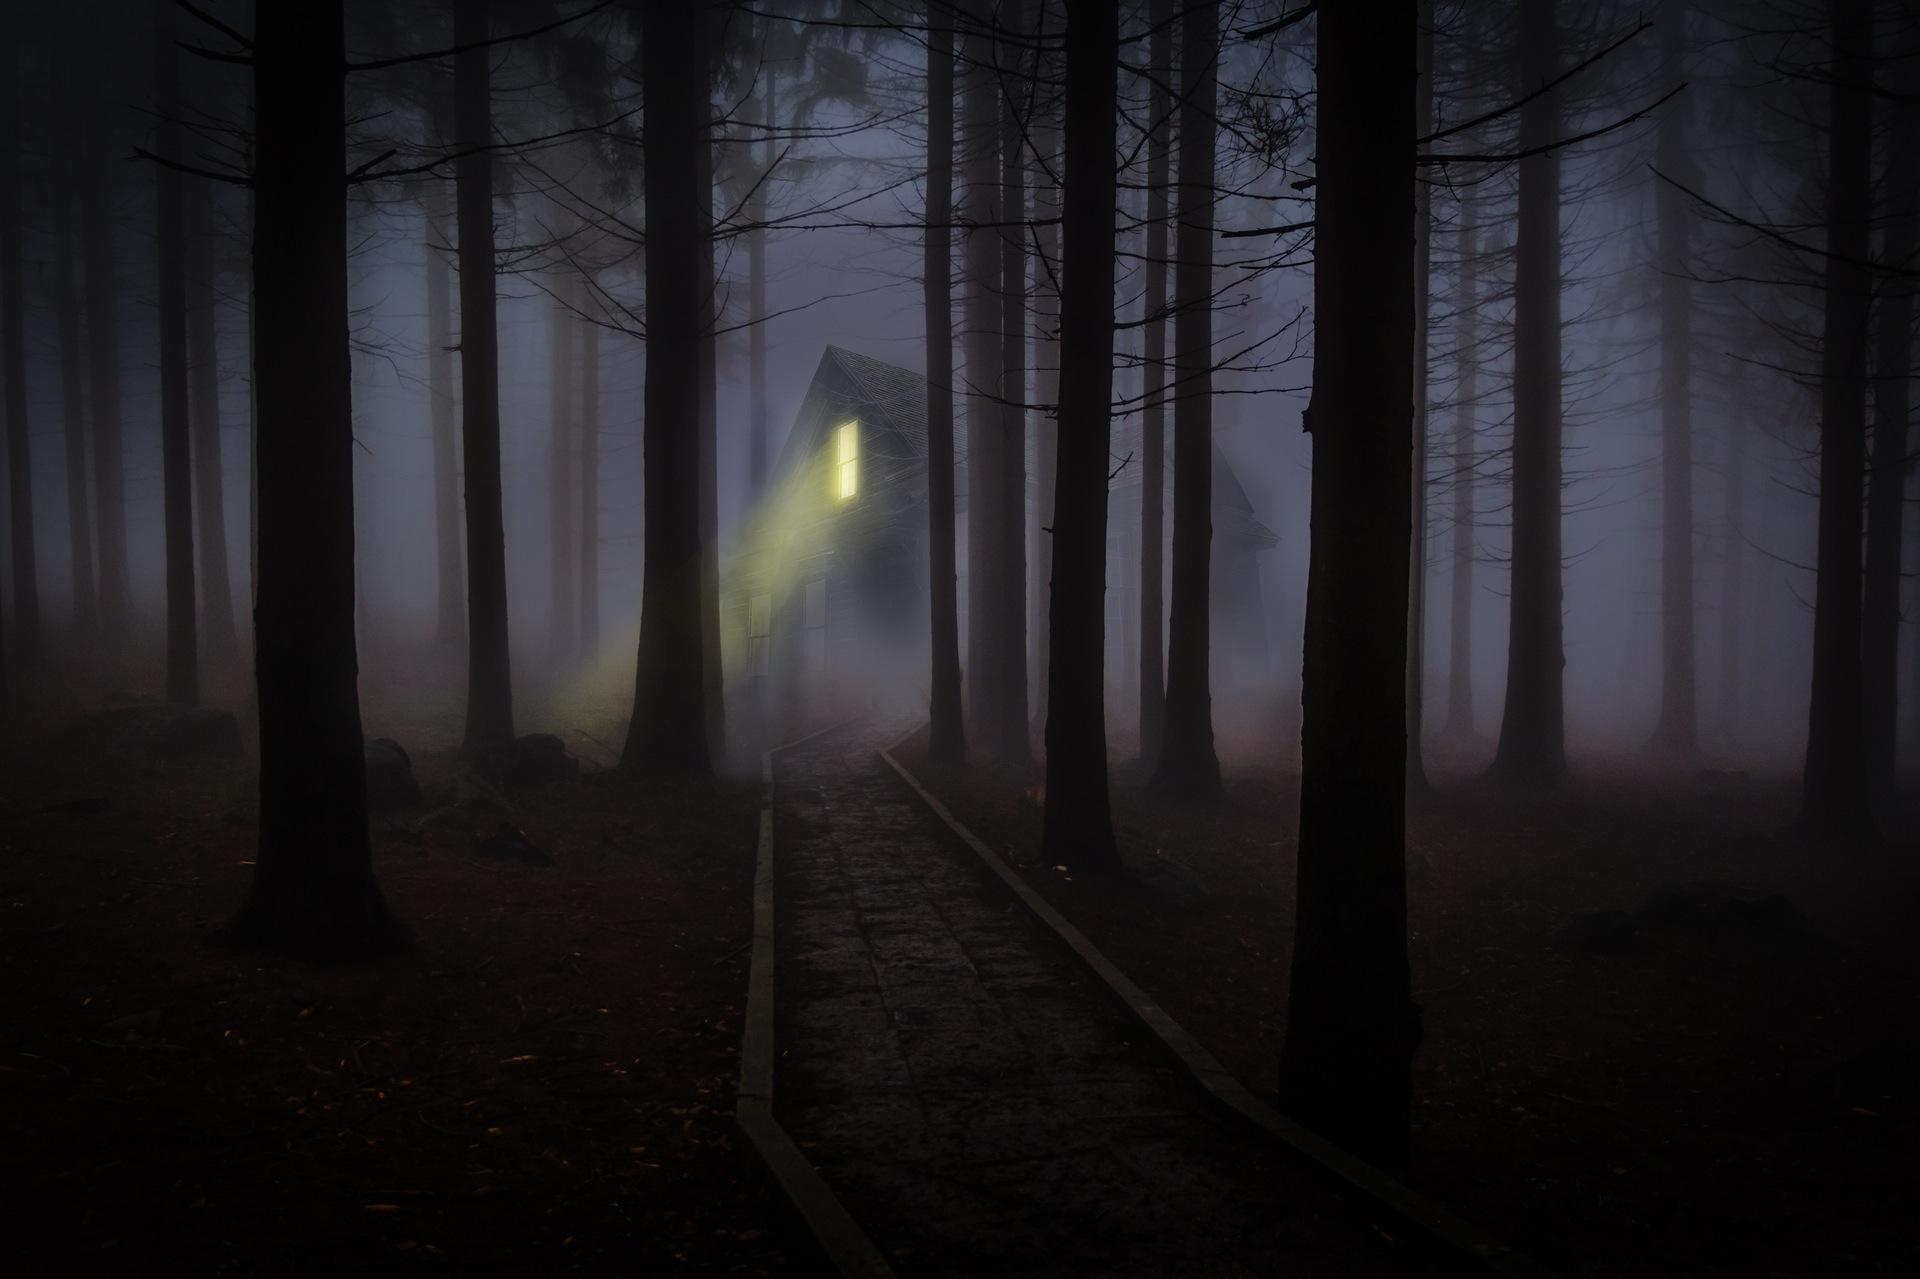 vía, tren, niebla, casa, bosque - Fondos de Pantalla HD - professor-falken.com